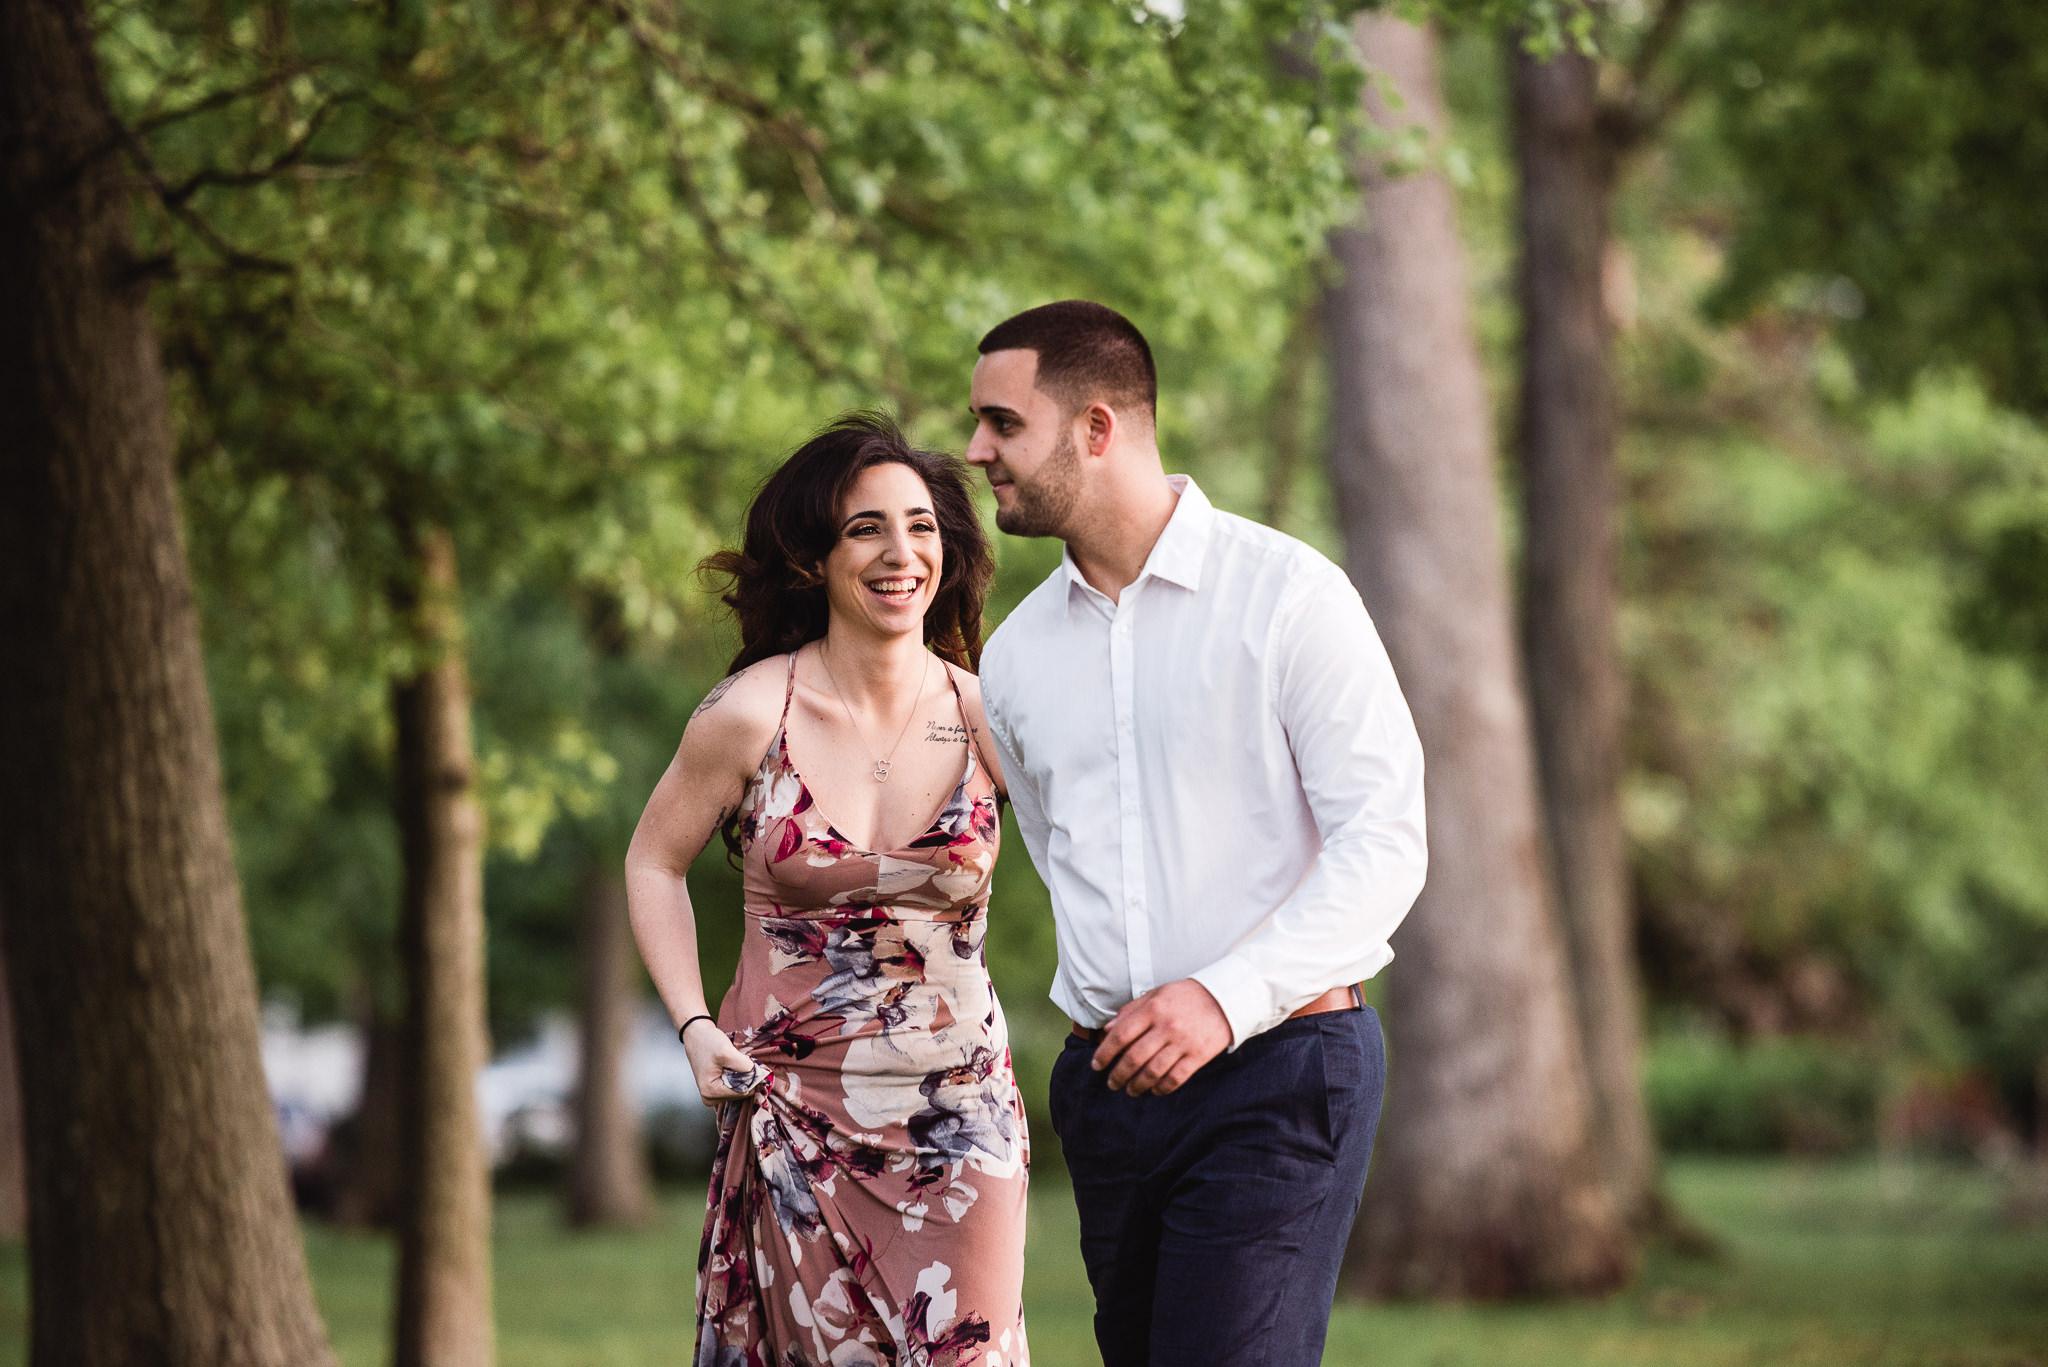 VERONA_PARK_ENGAGEMENT_TAMPA_WEDDING_PHOTOGRAPHER_5266.jpg